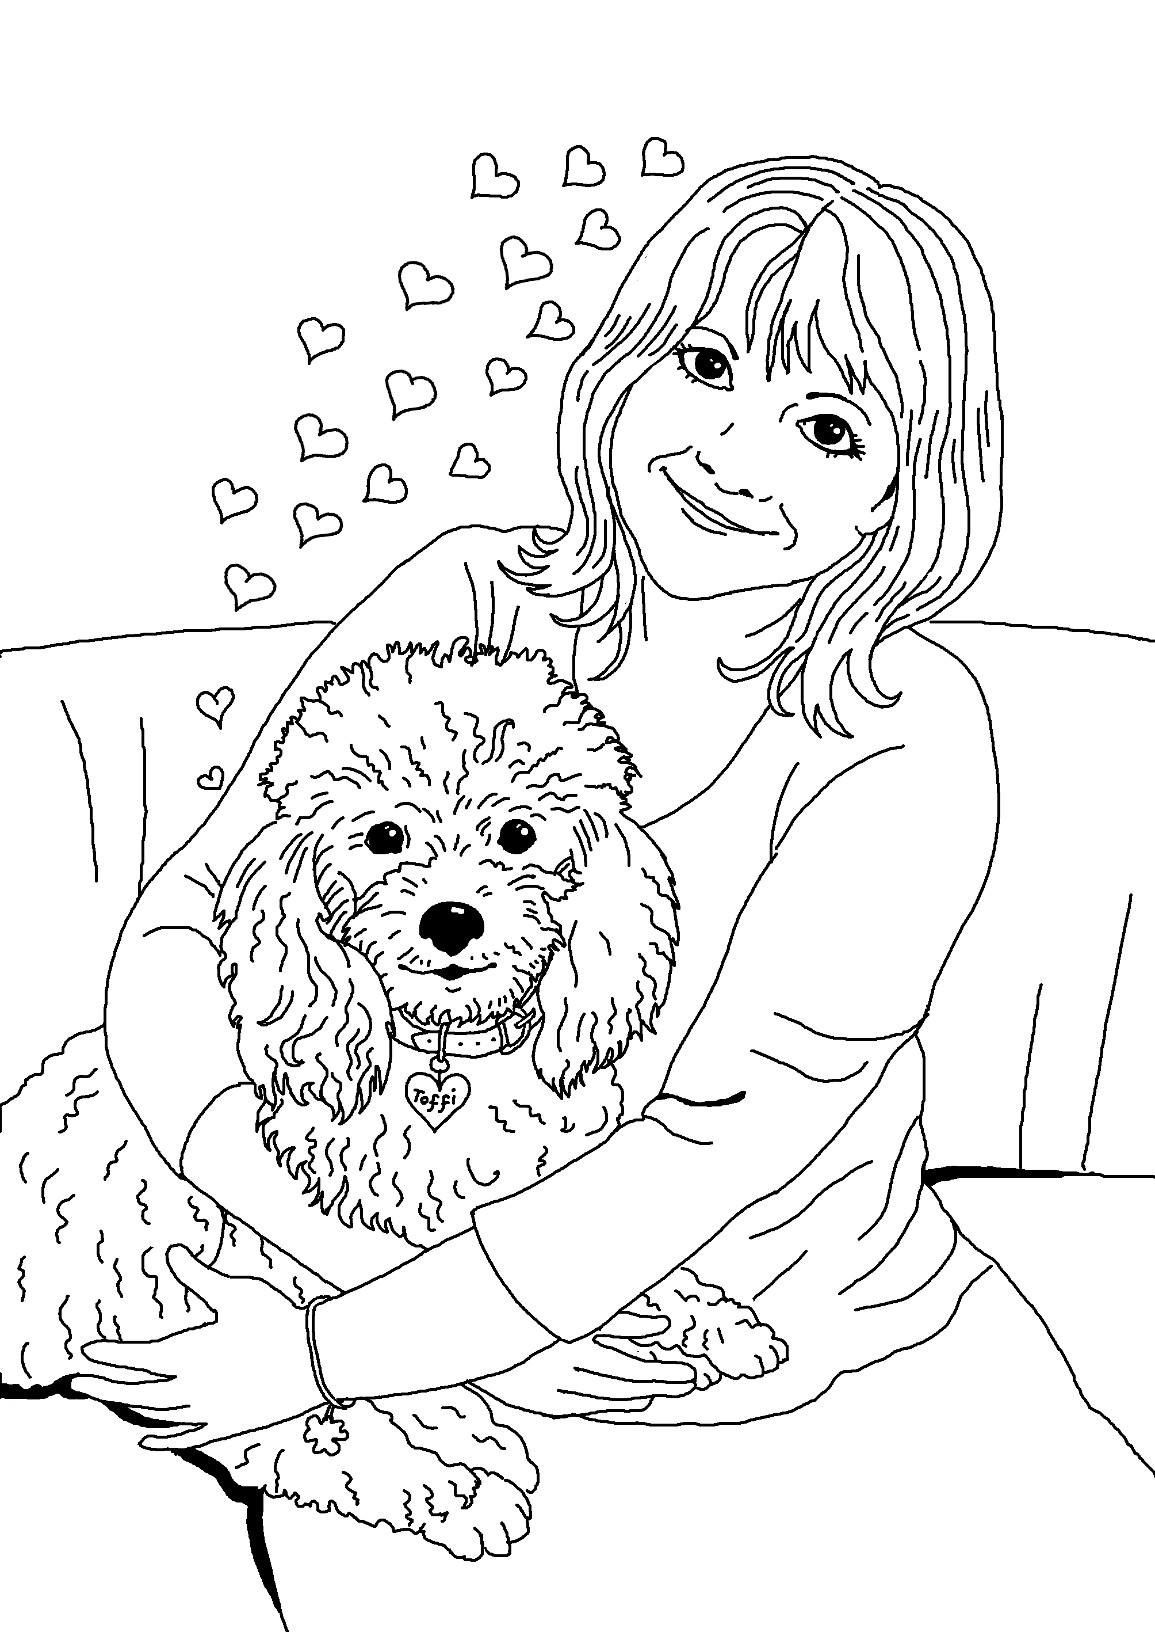 toffi ilustracja 2